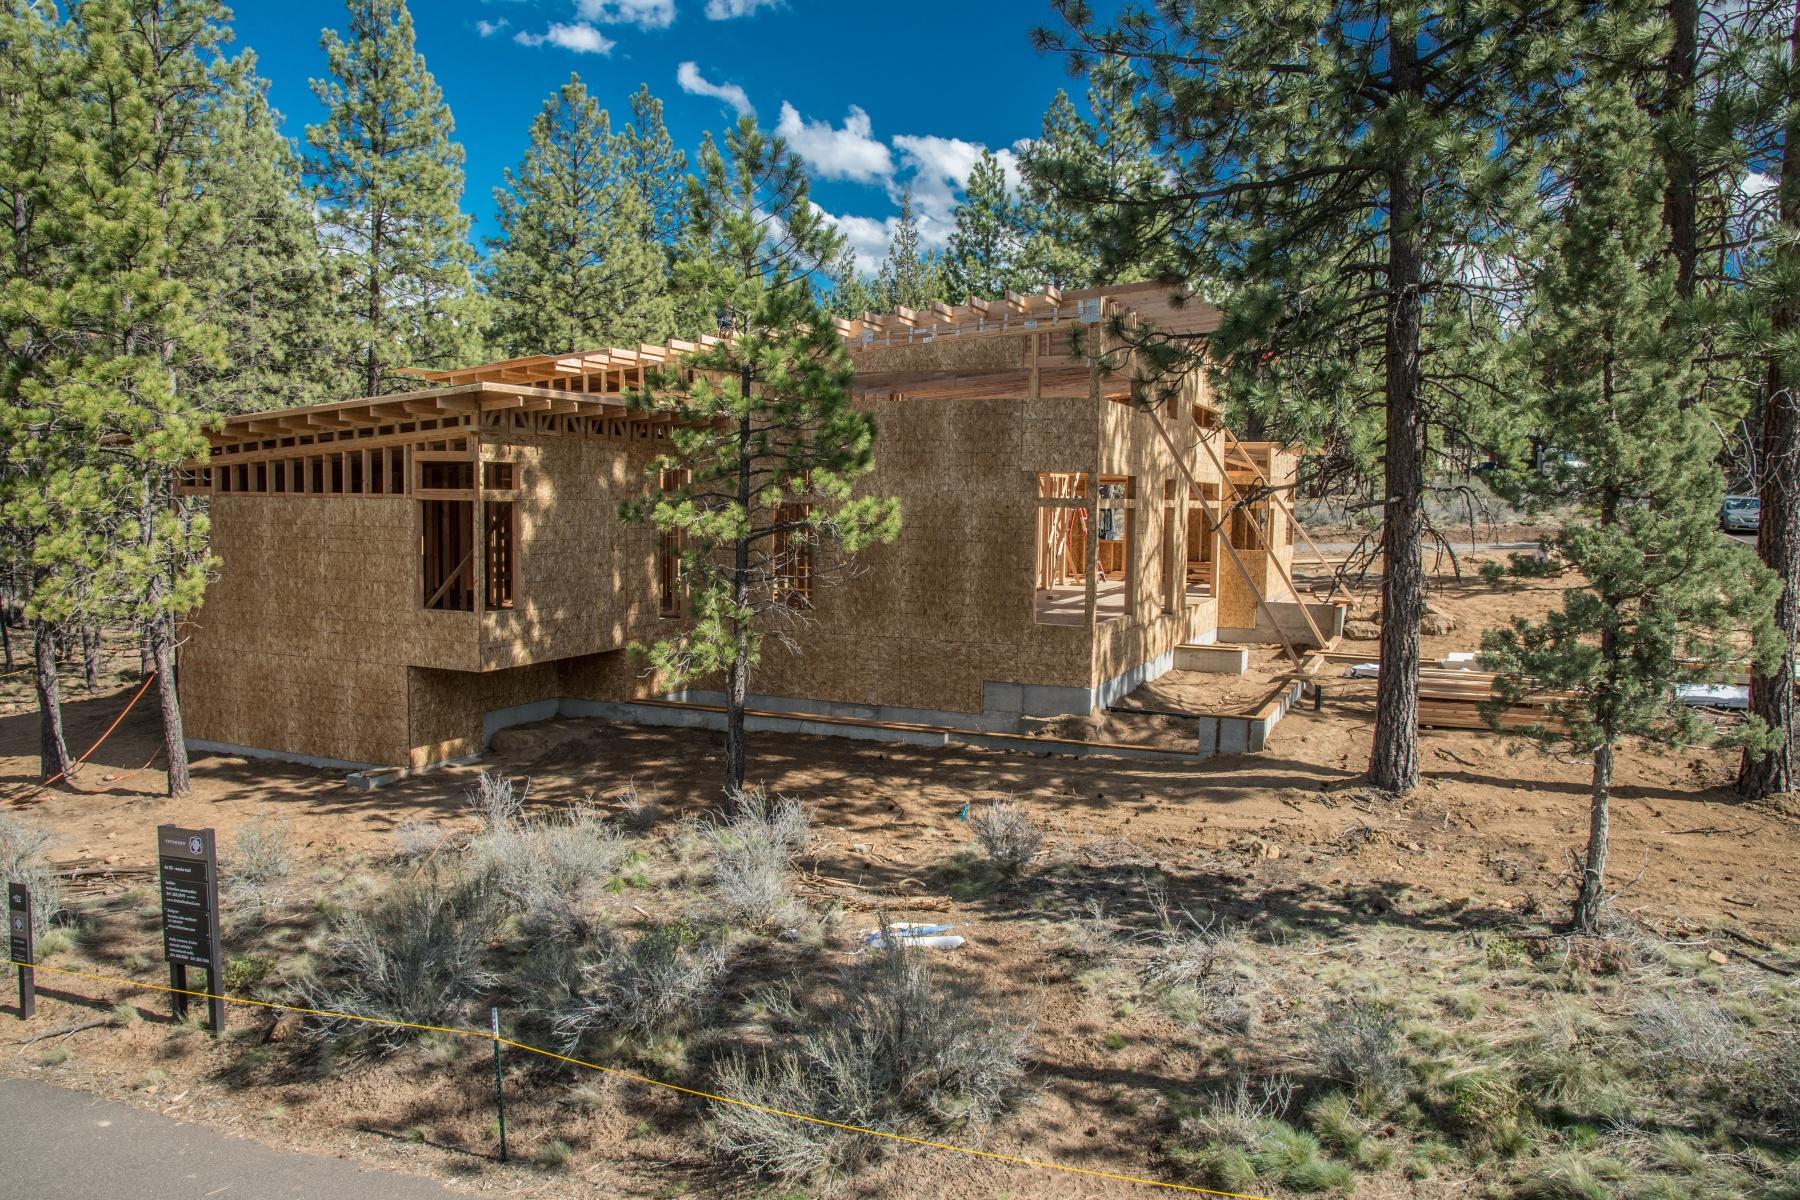 Single Family Home for Sale at Tetherow 19450 Bainbridge Ct Bend, Oregon 97702 United States